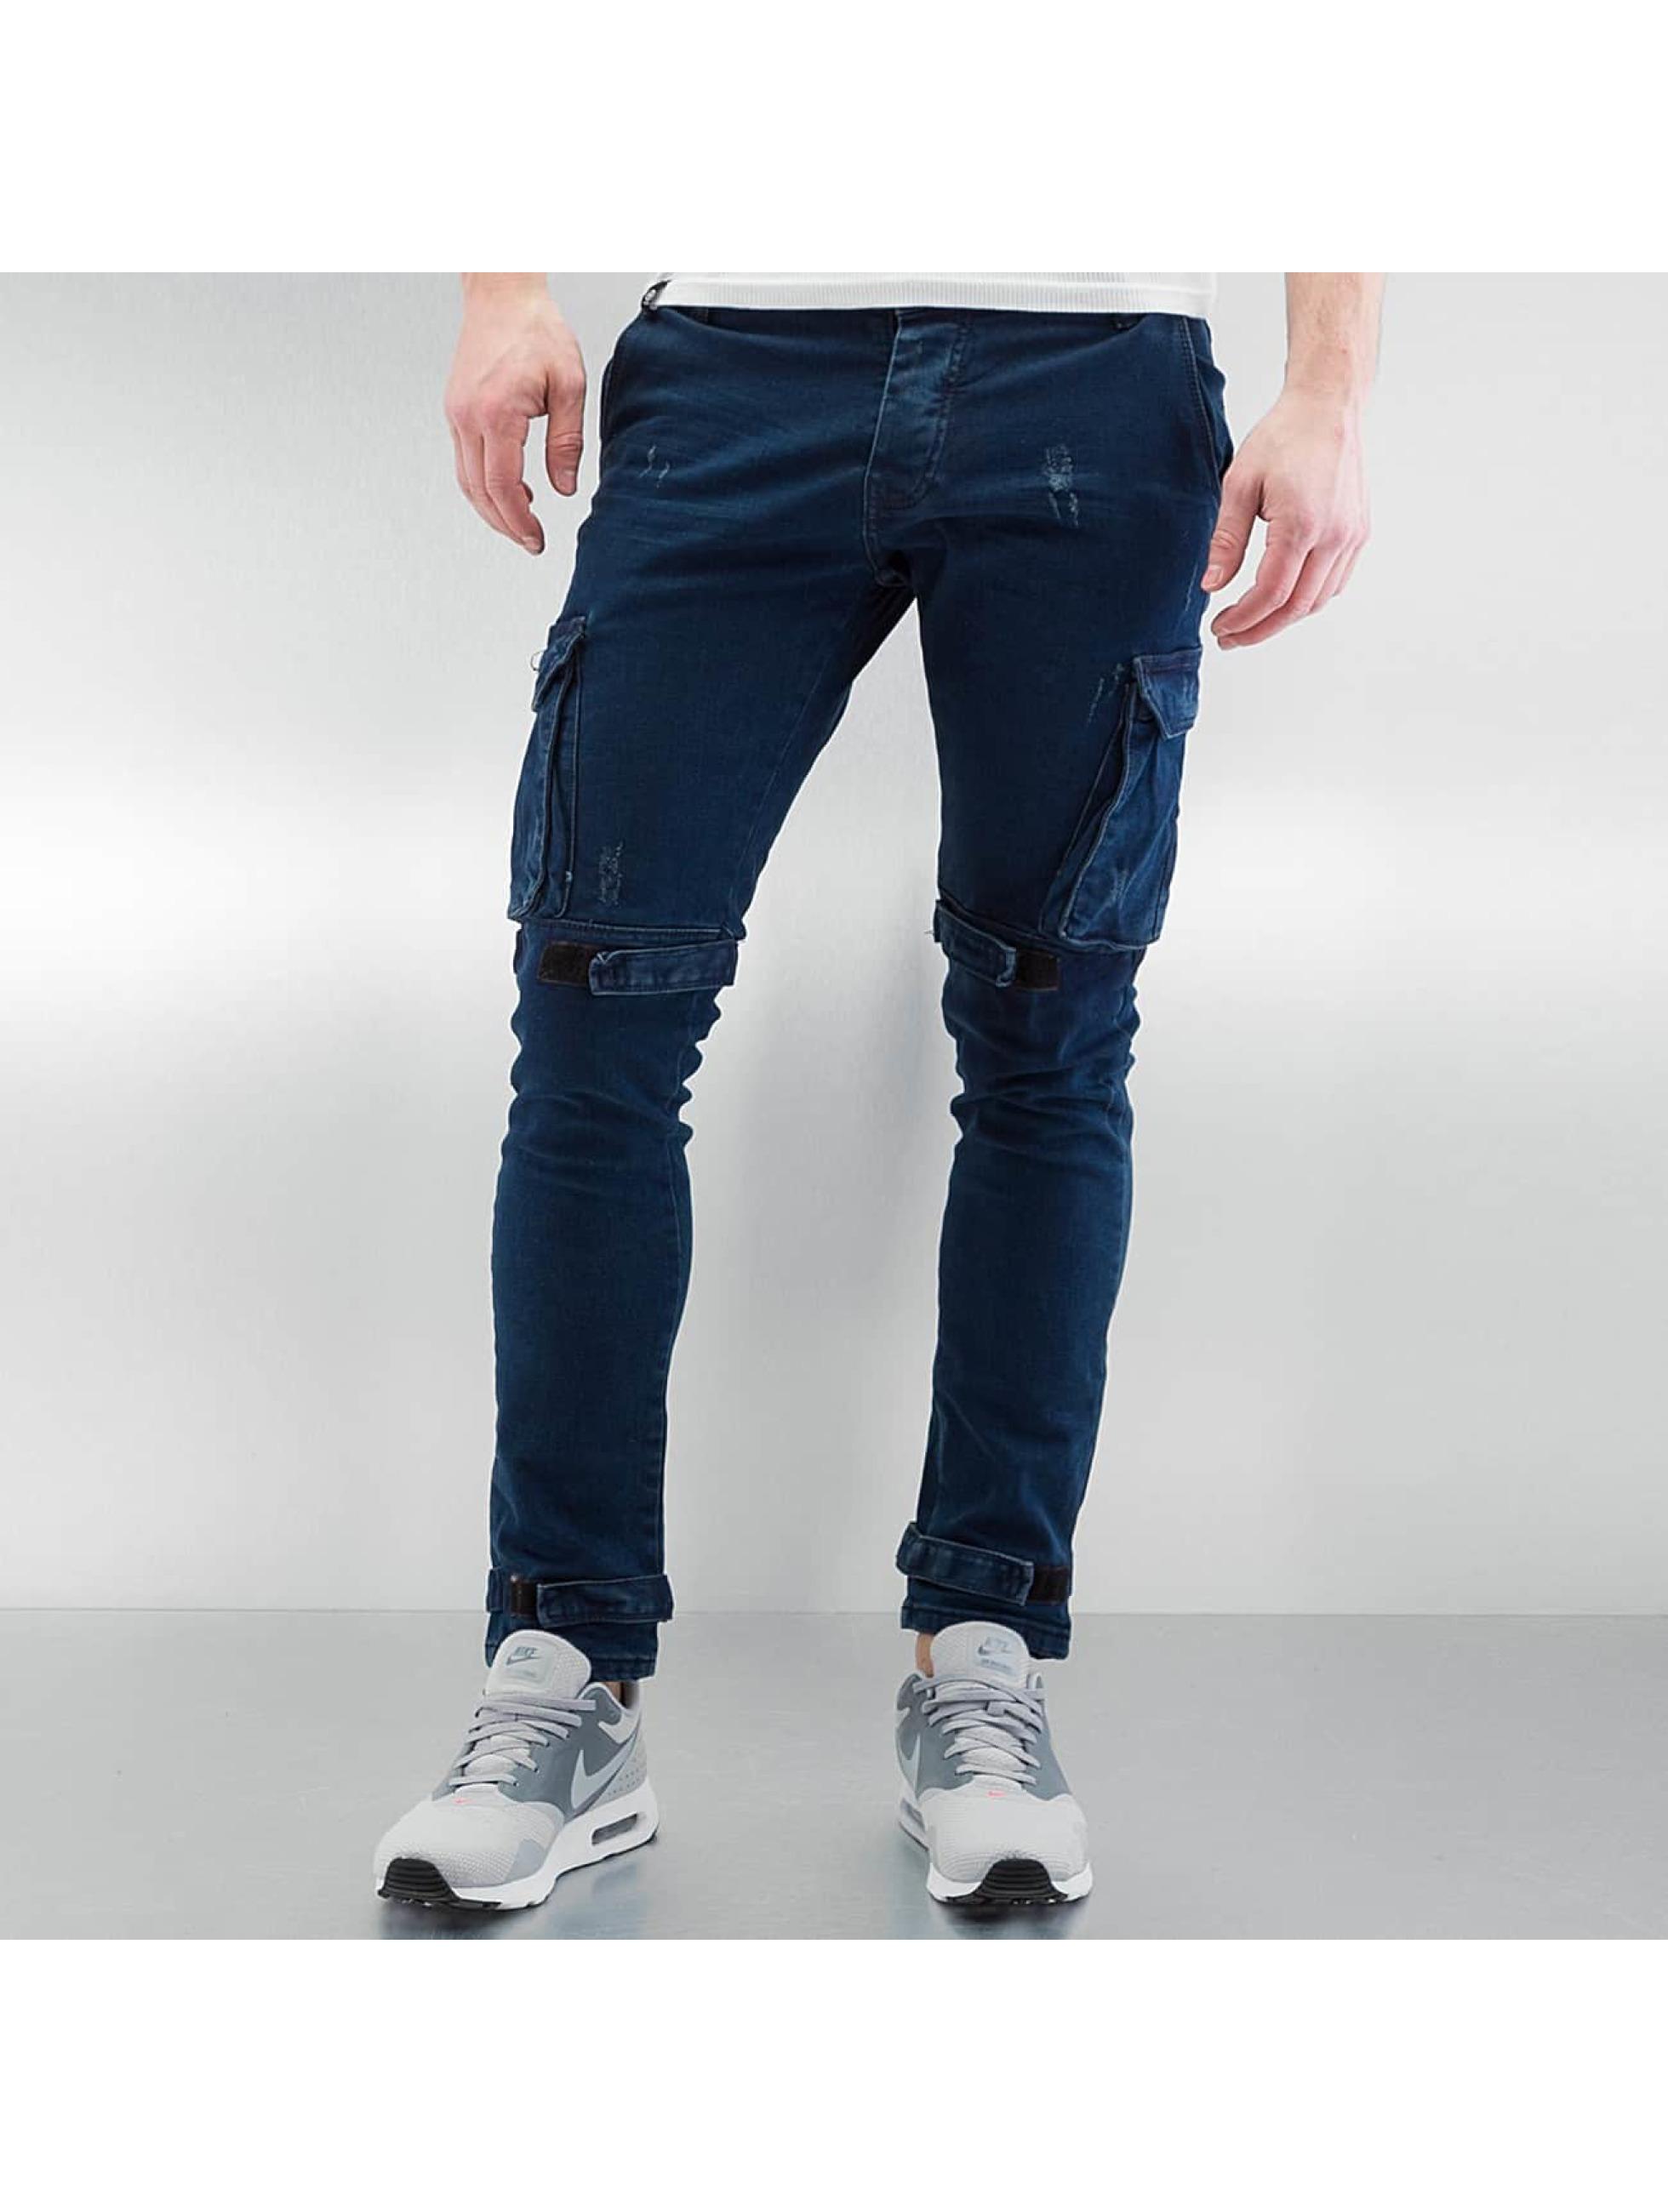 2Y Cargo pants Velcro Closure blue